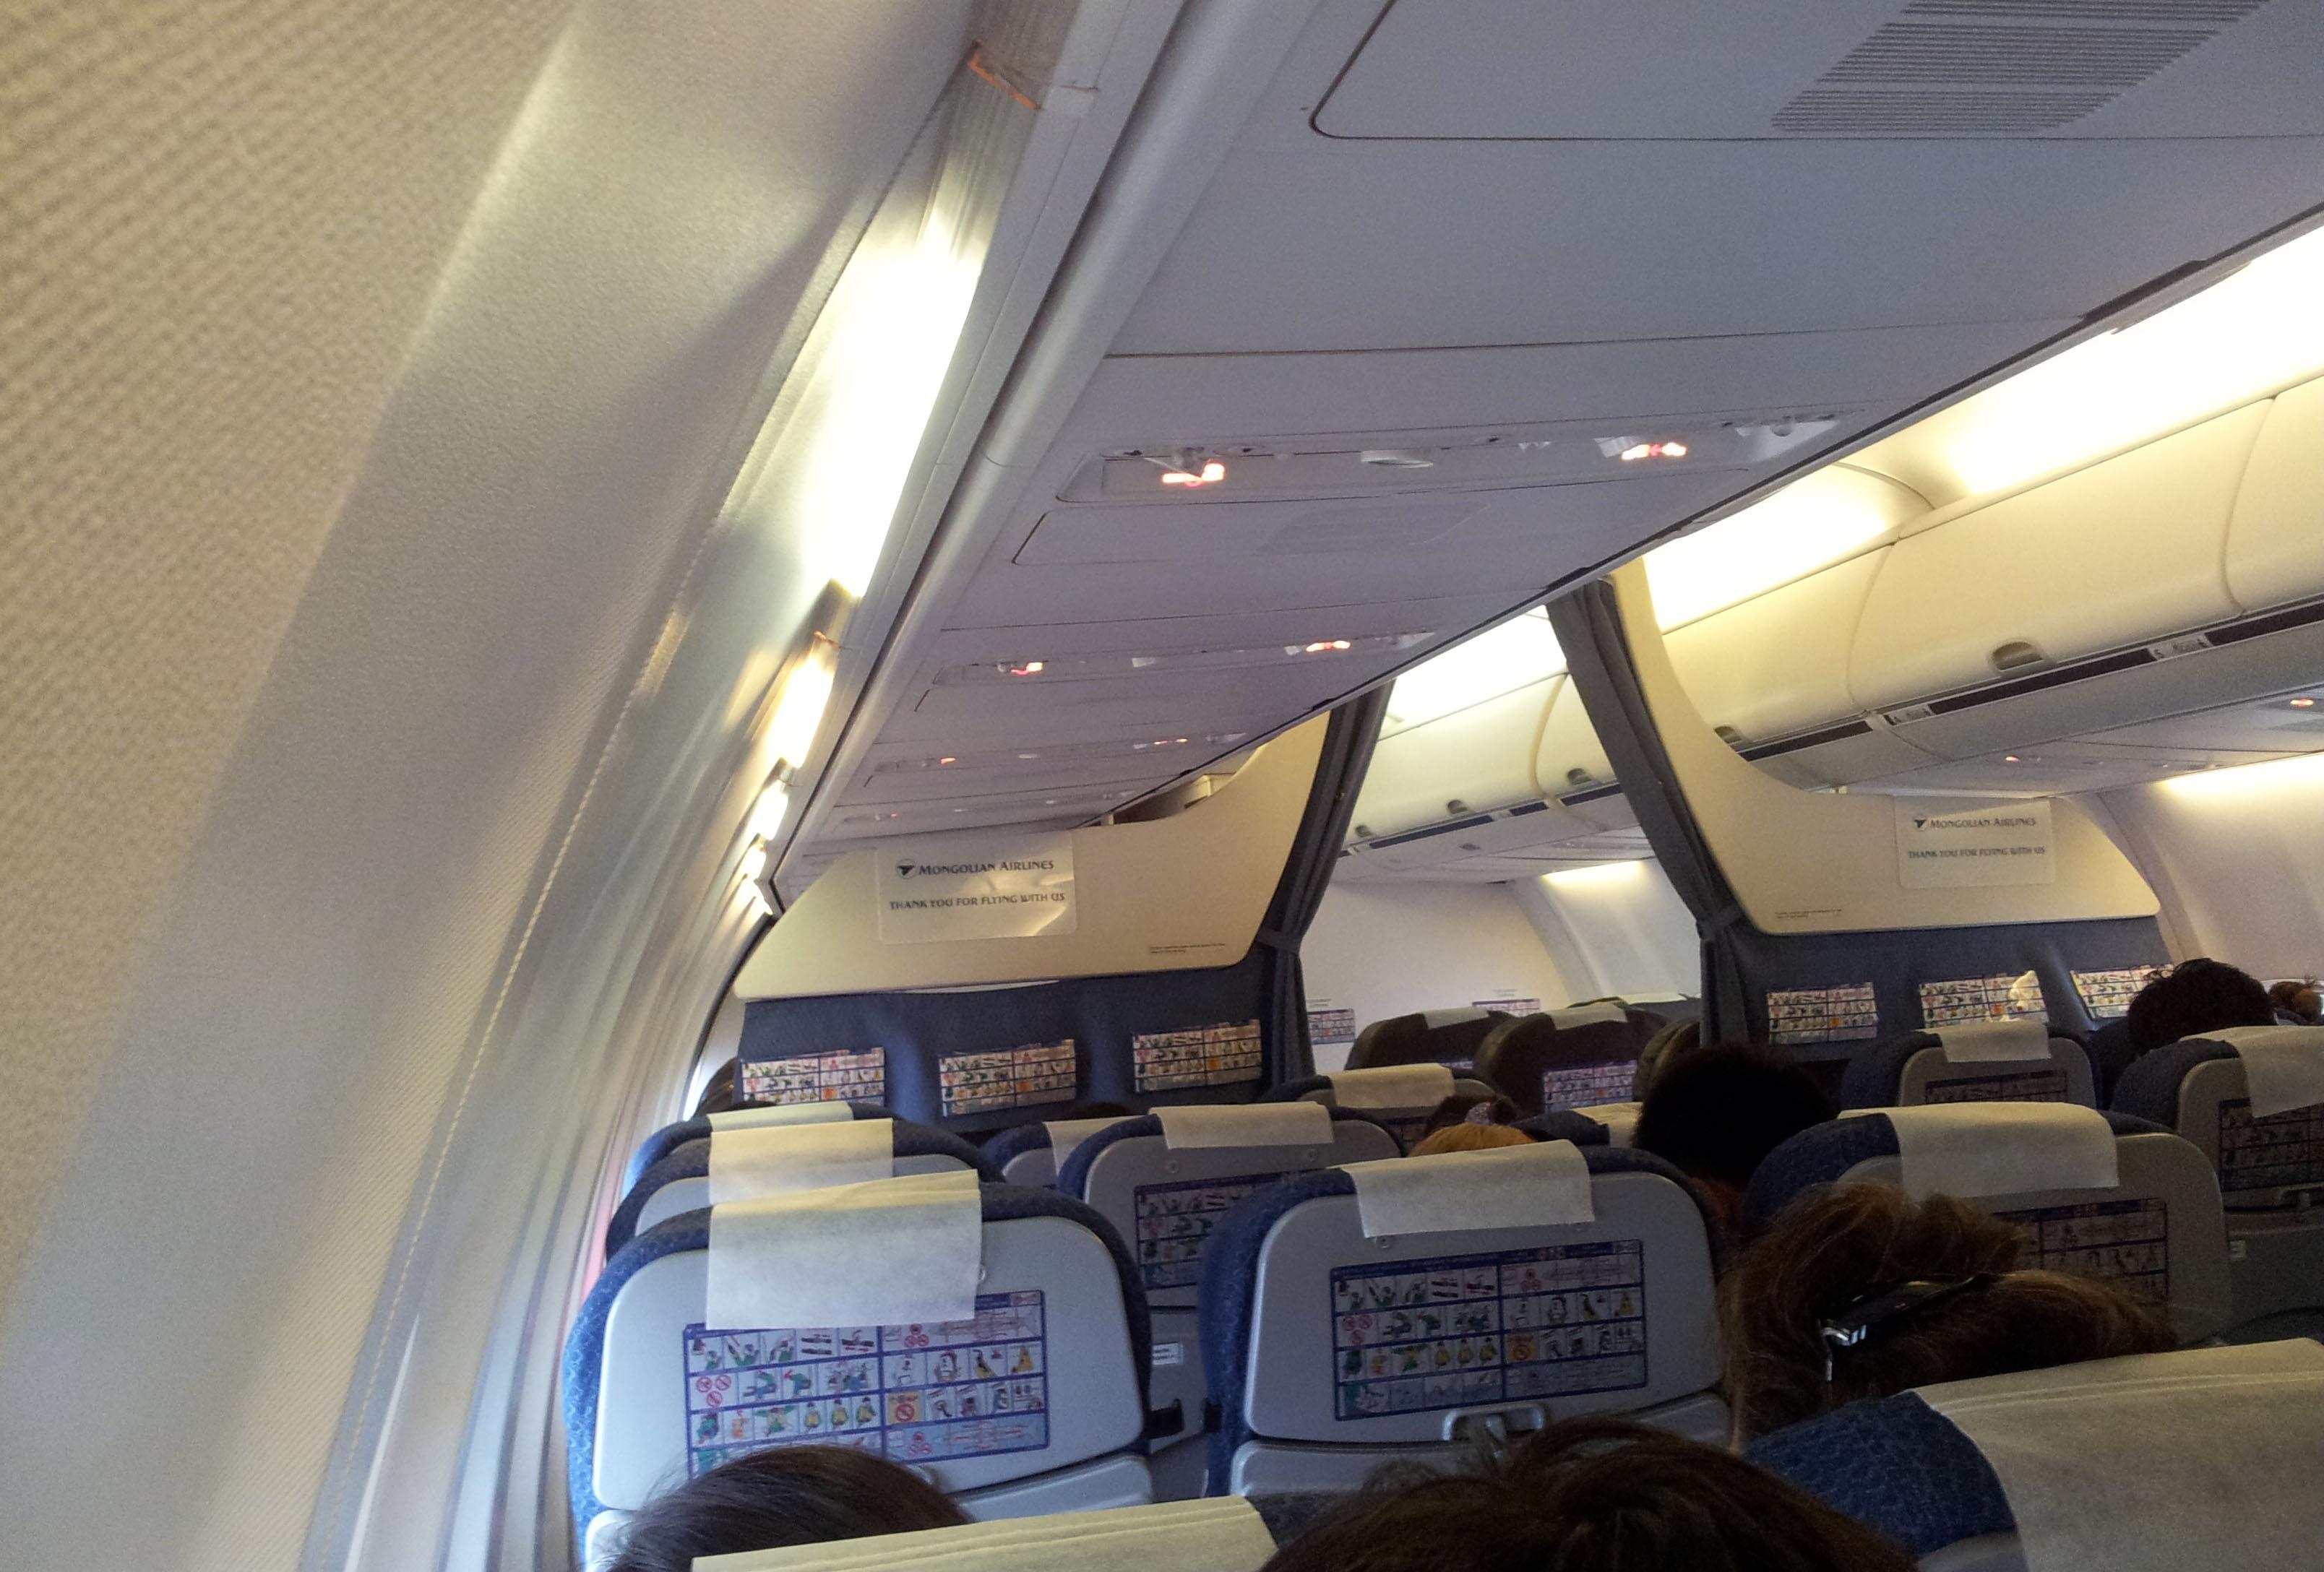 Boeing 737 800 aircraft inside image - File Miat Boeing 737 800 Interior Jpg